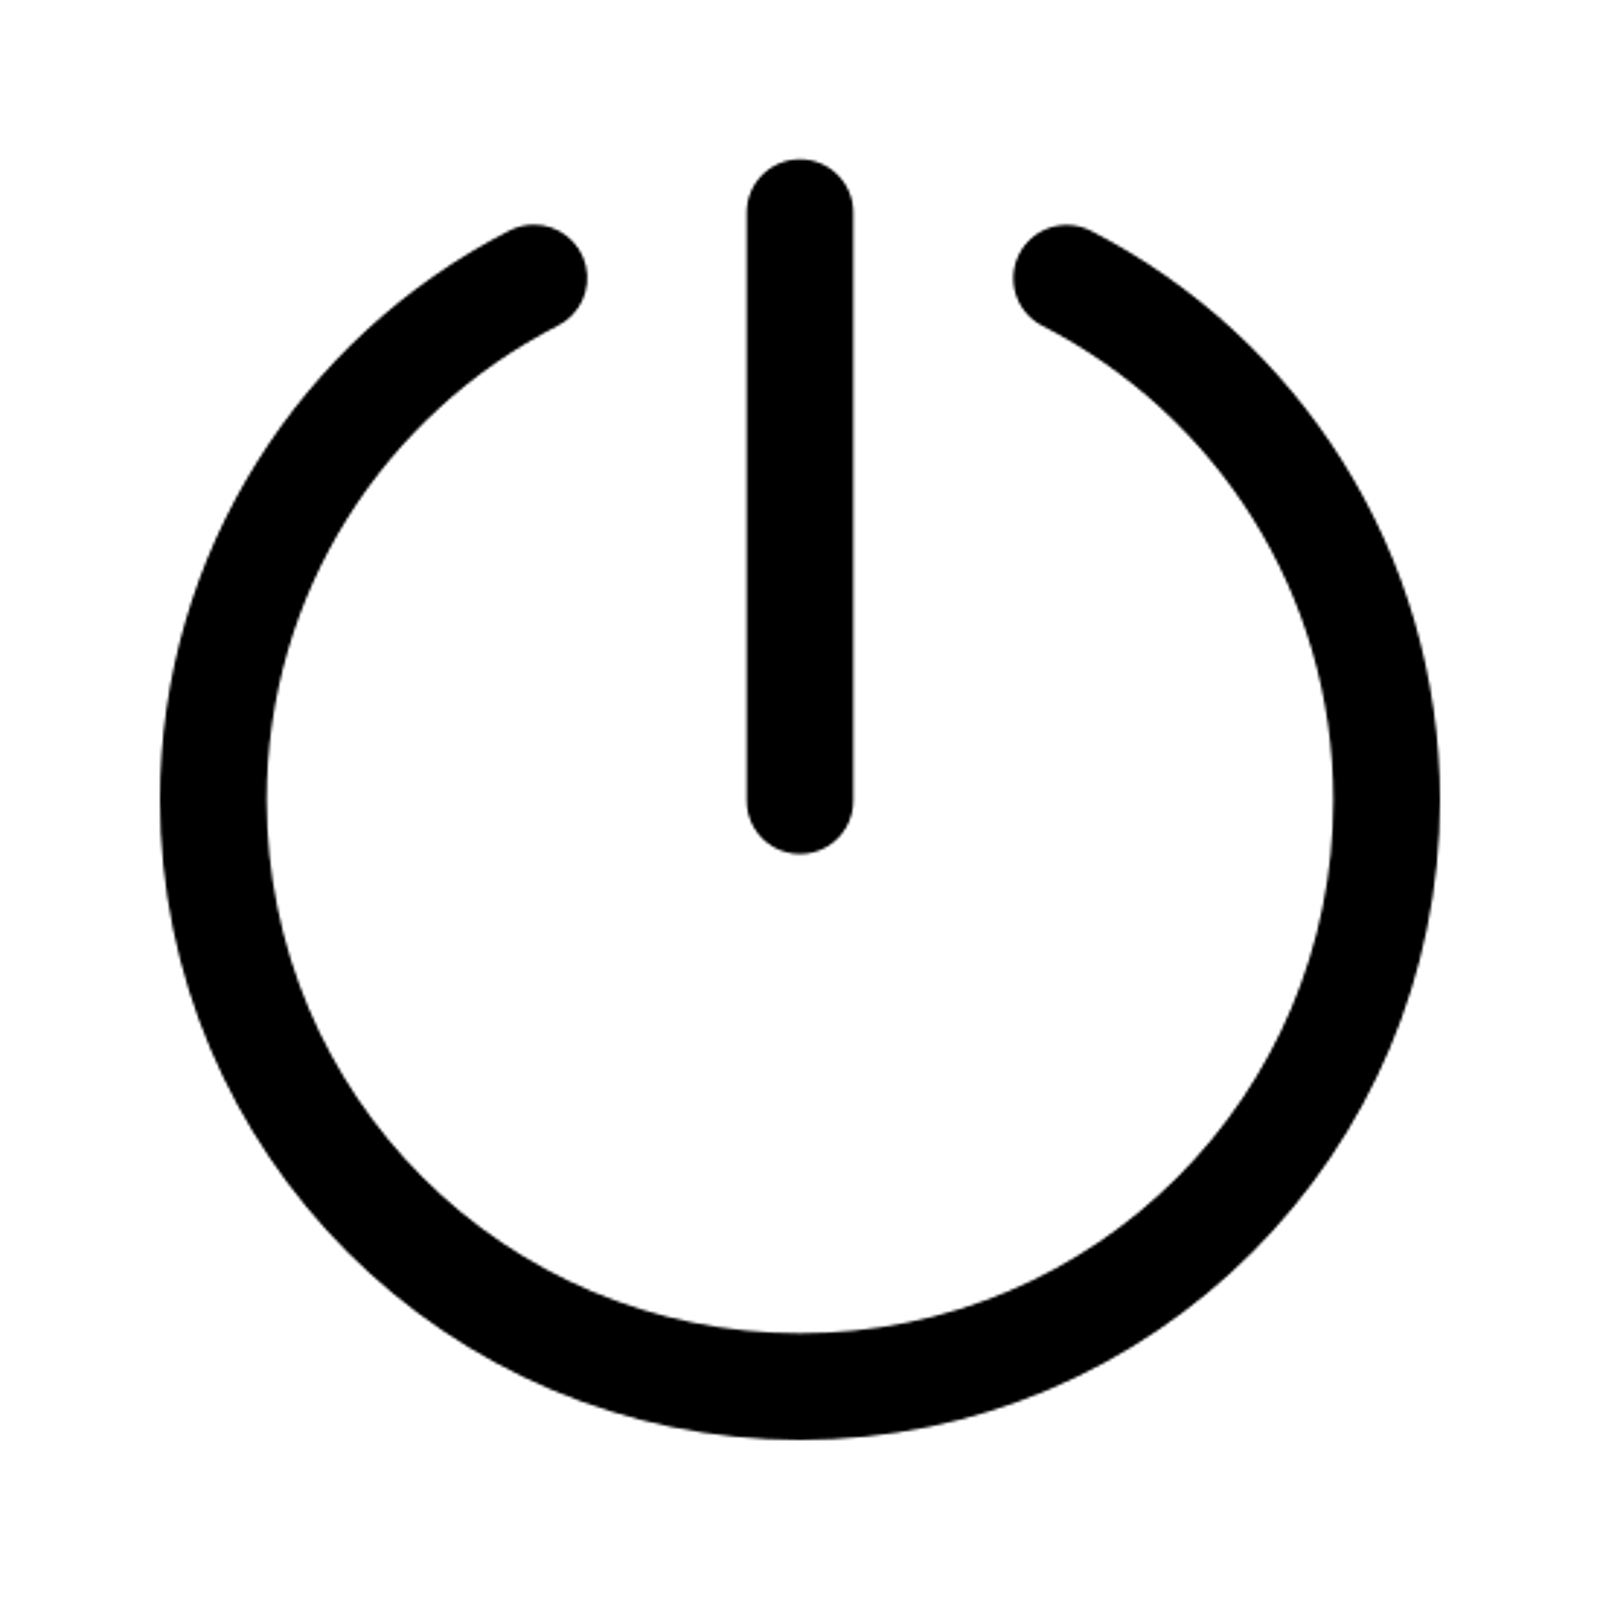 Apagar icon